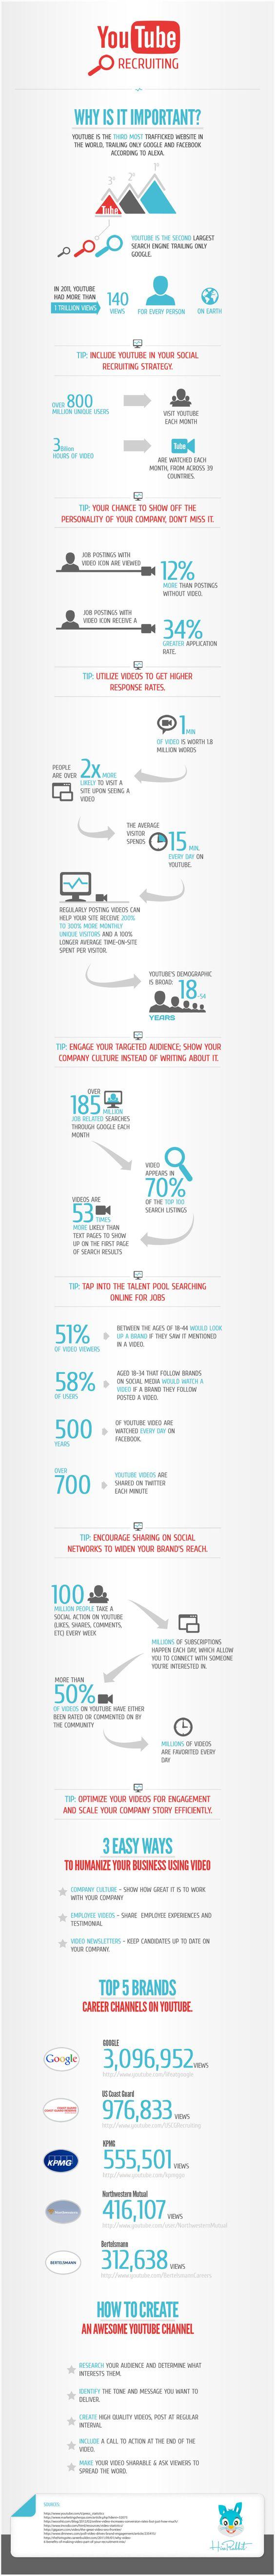 YouTube: The Secret Ingredient for Job Recruitment #infographic